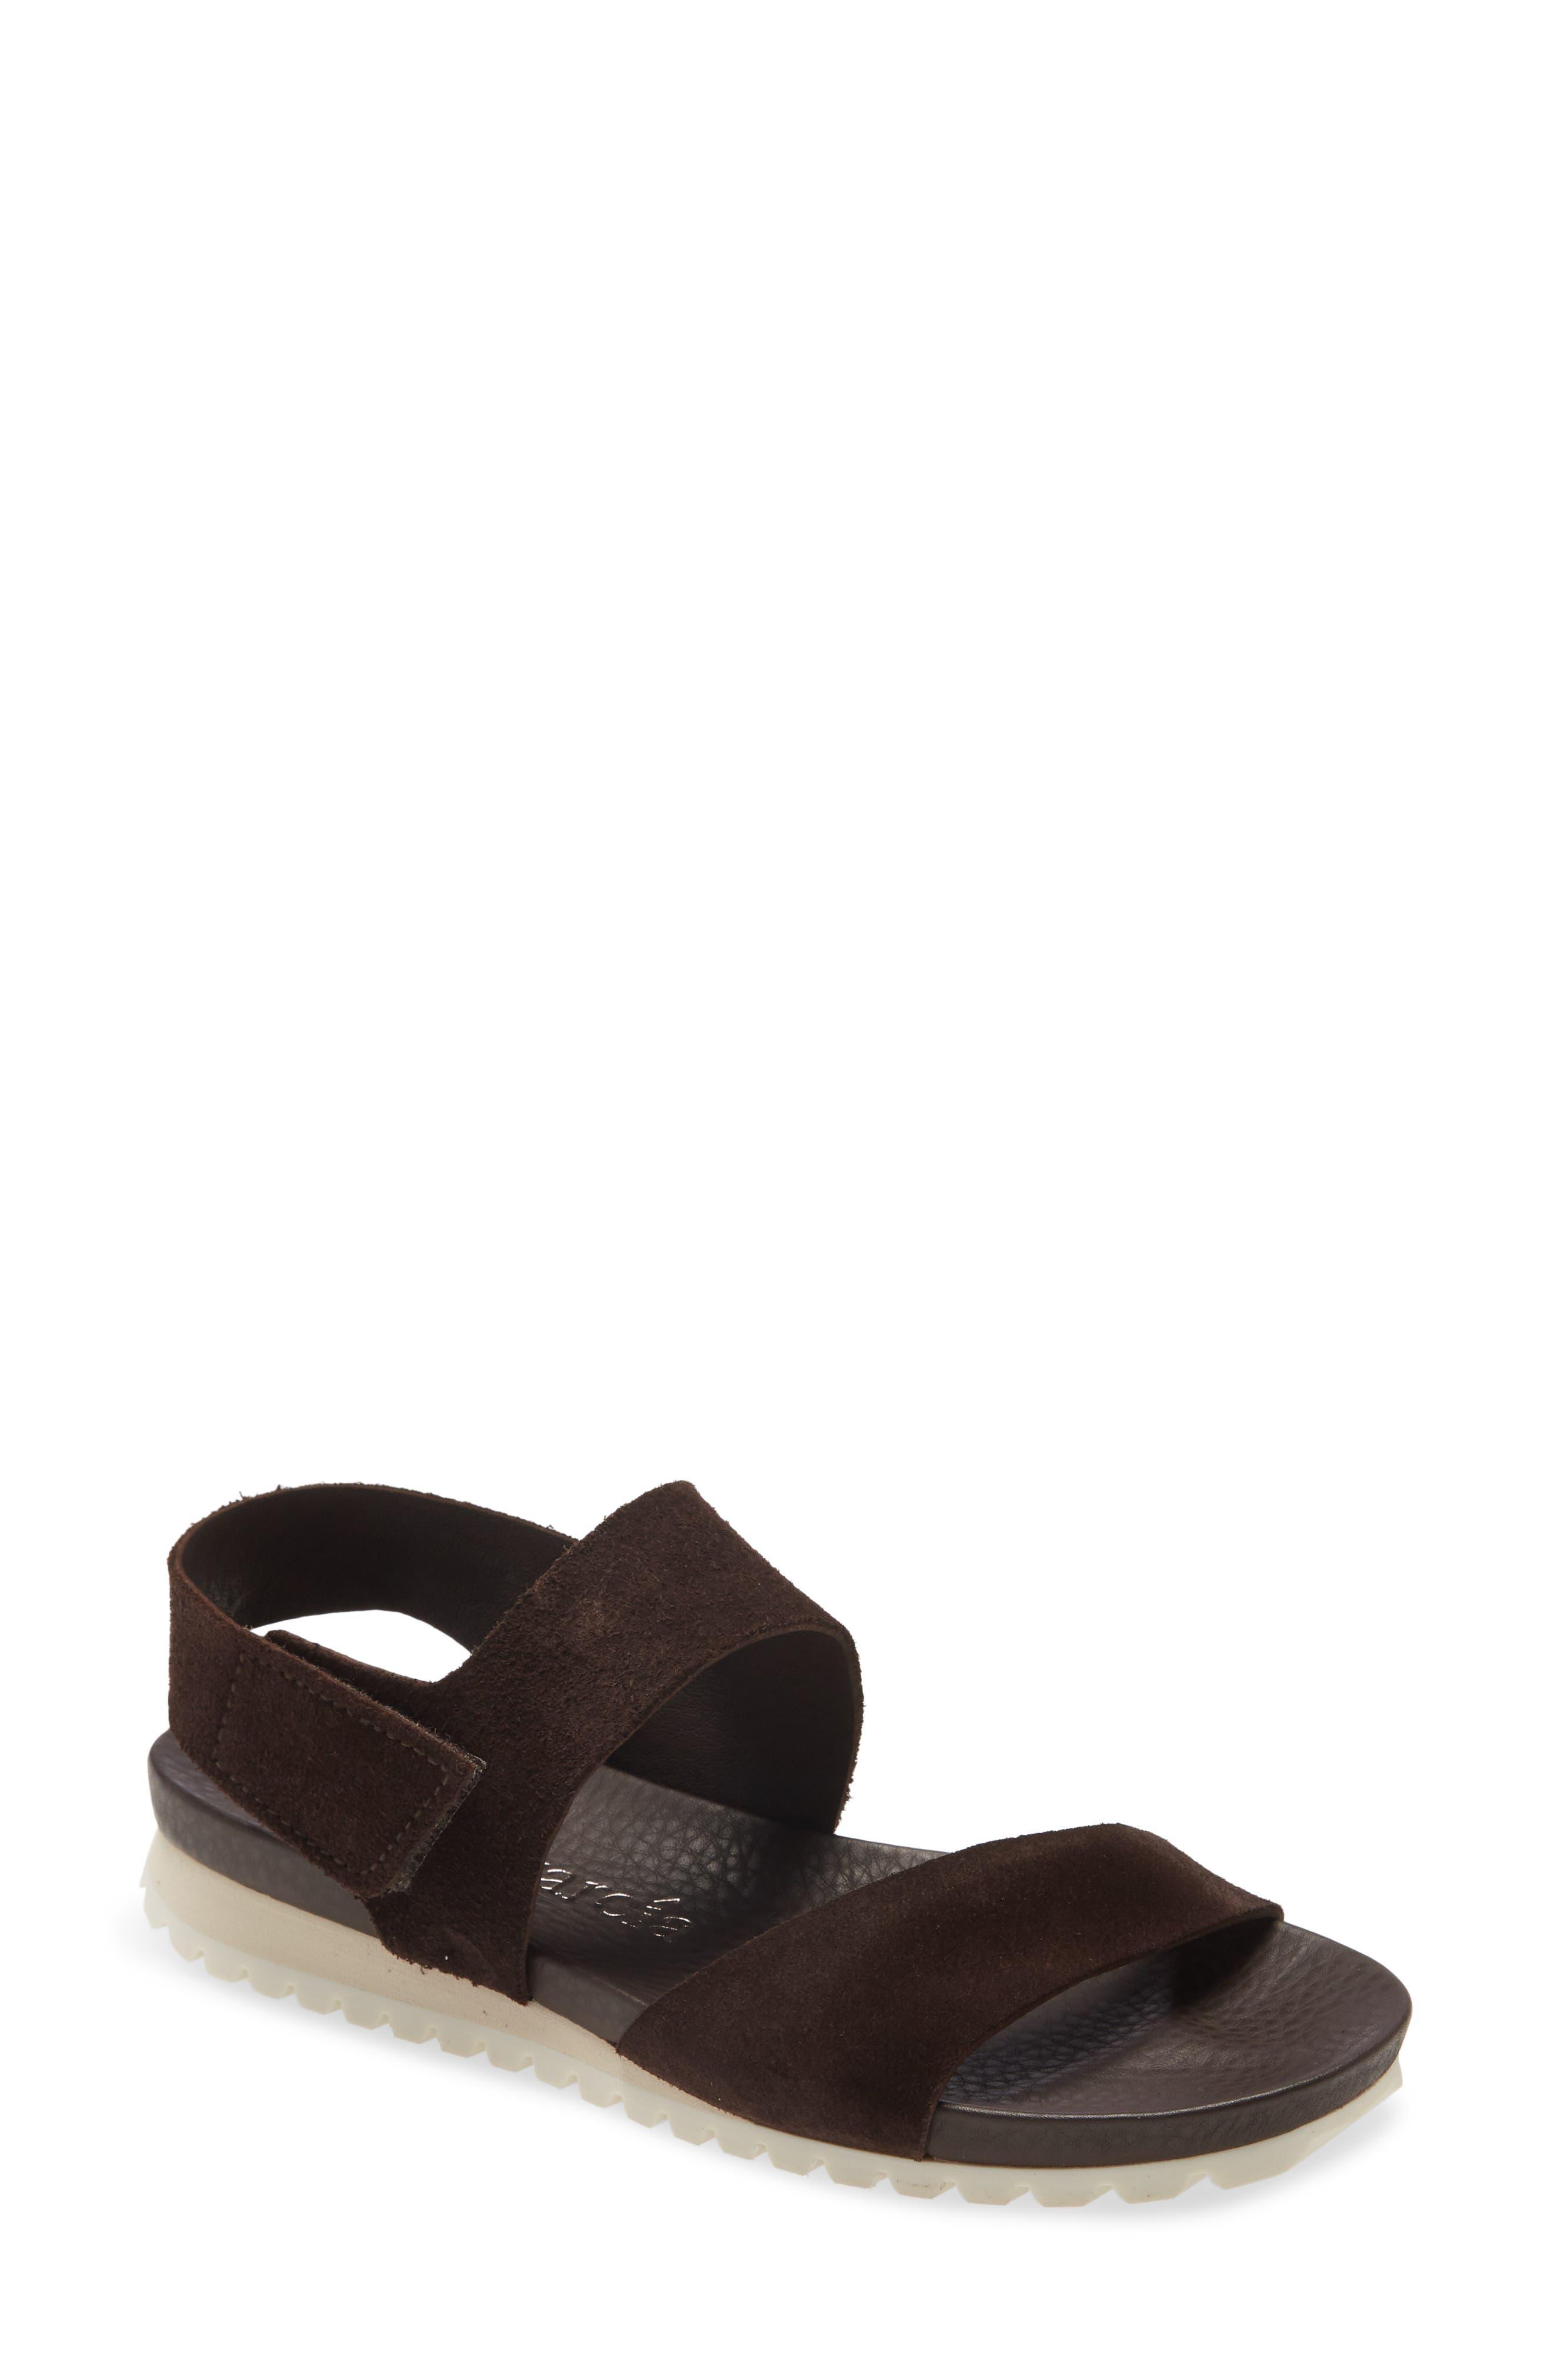 Image of PEDRO GARCIA Jeong Slingback Wedge Sandal